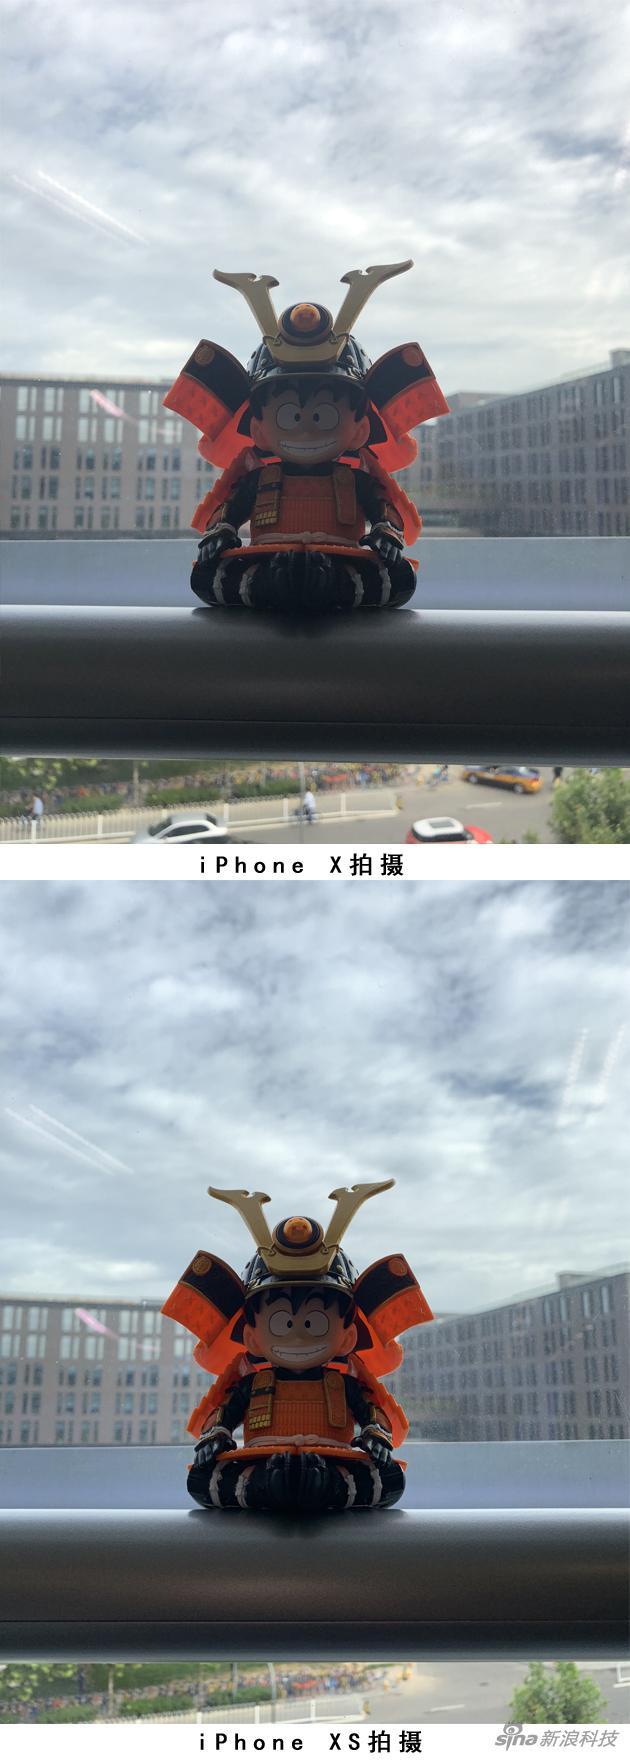 iPhone X和XS开启HDR逆光拍摄对比(对焦点均是小悟空脸部)